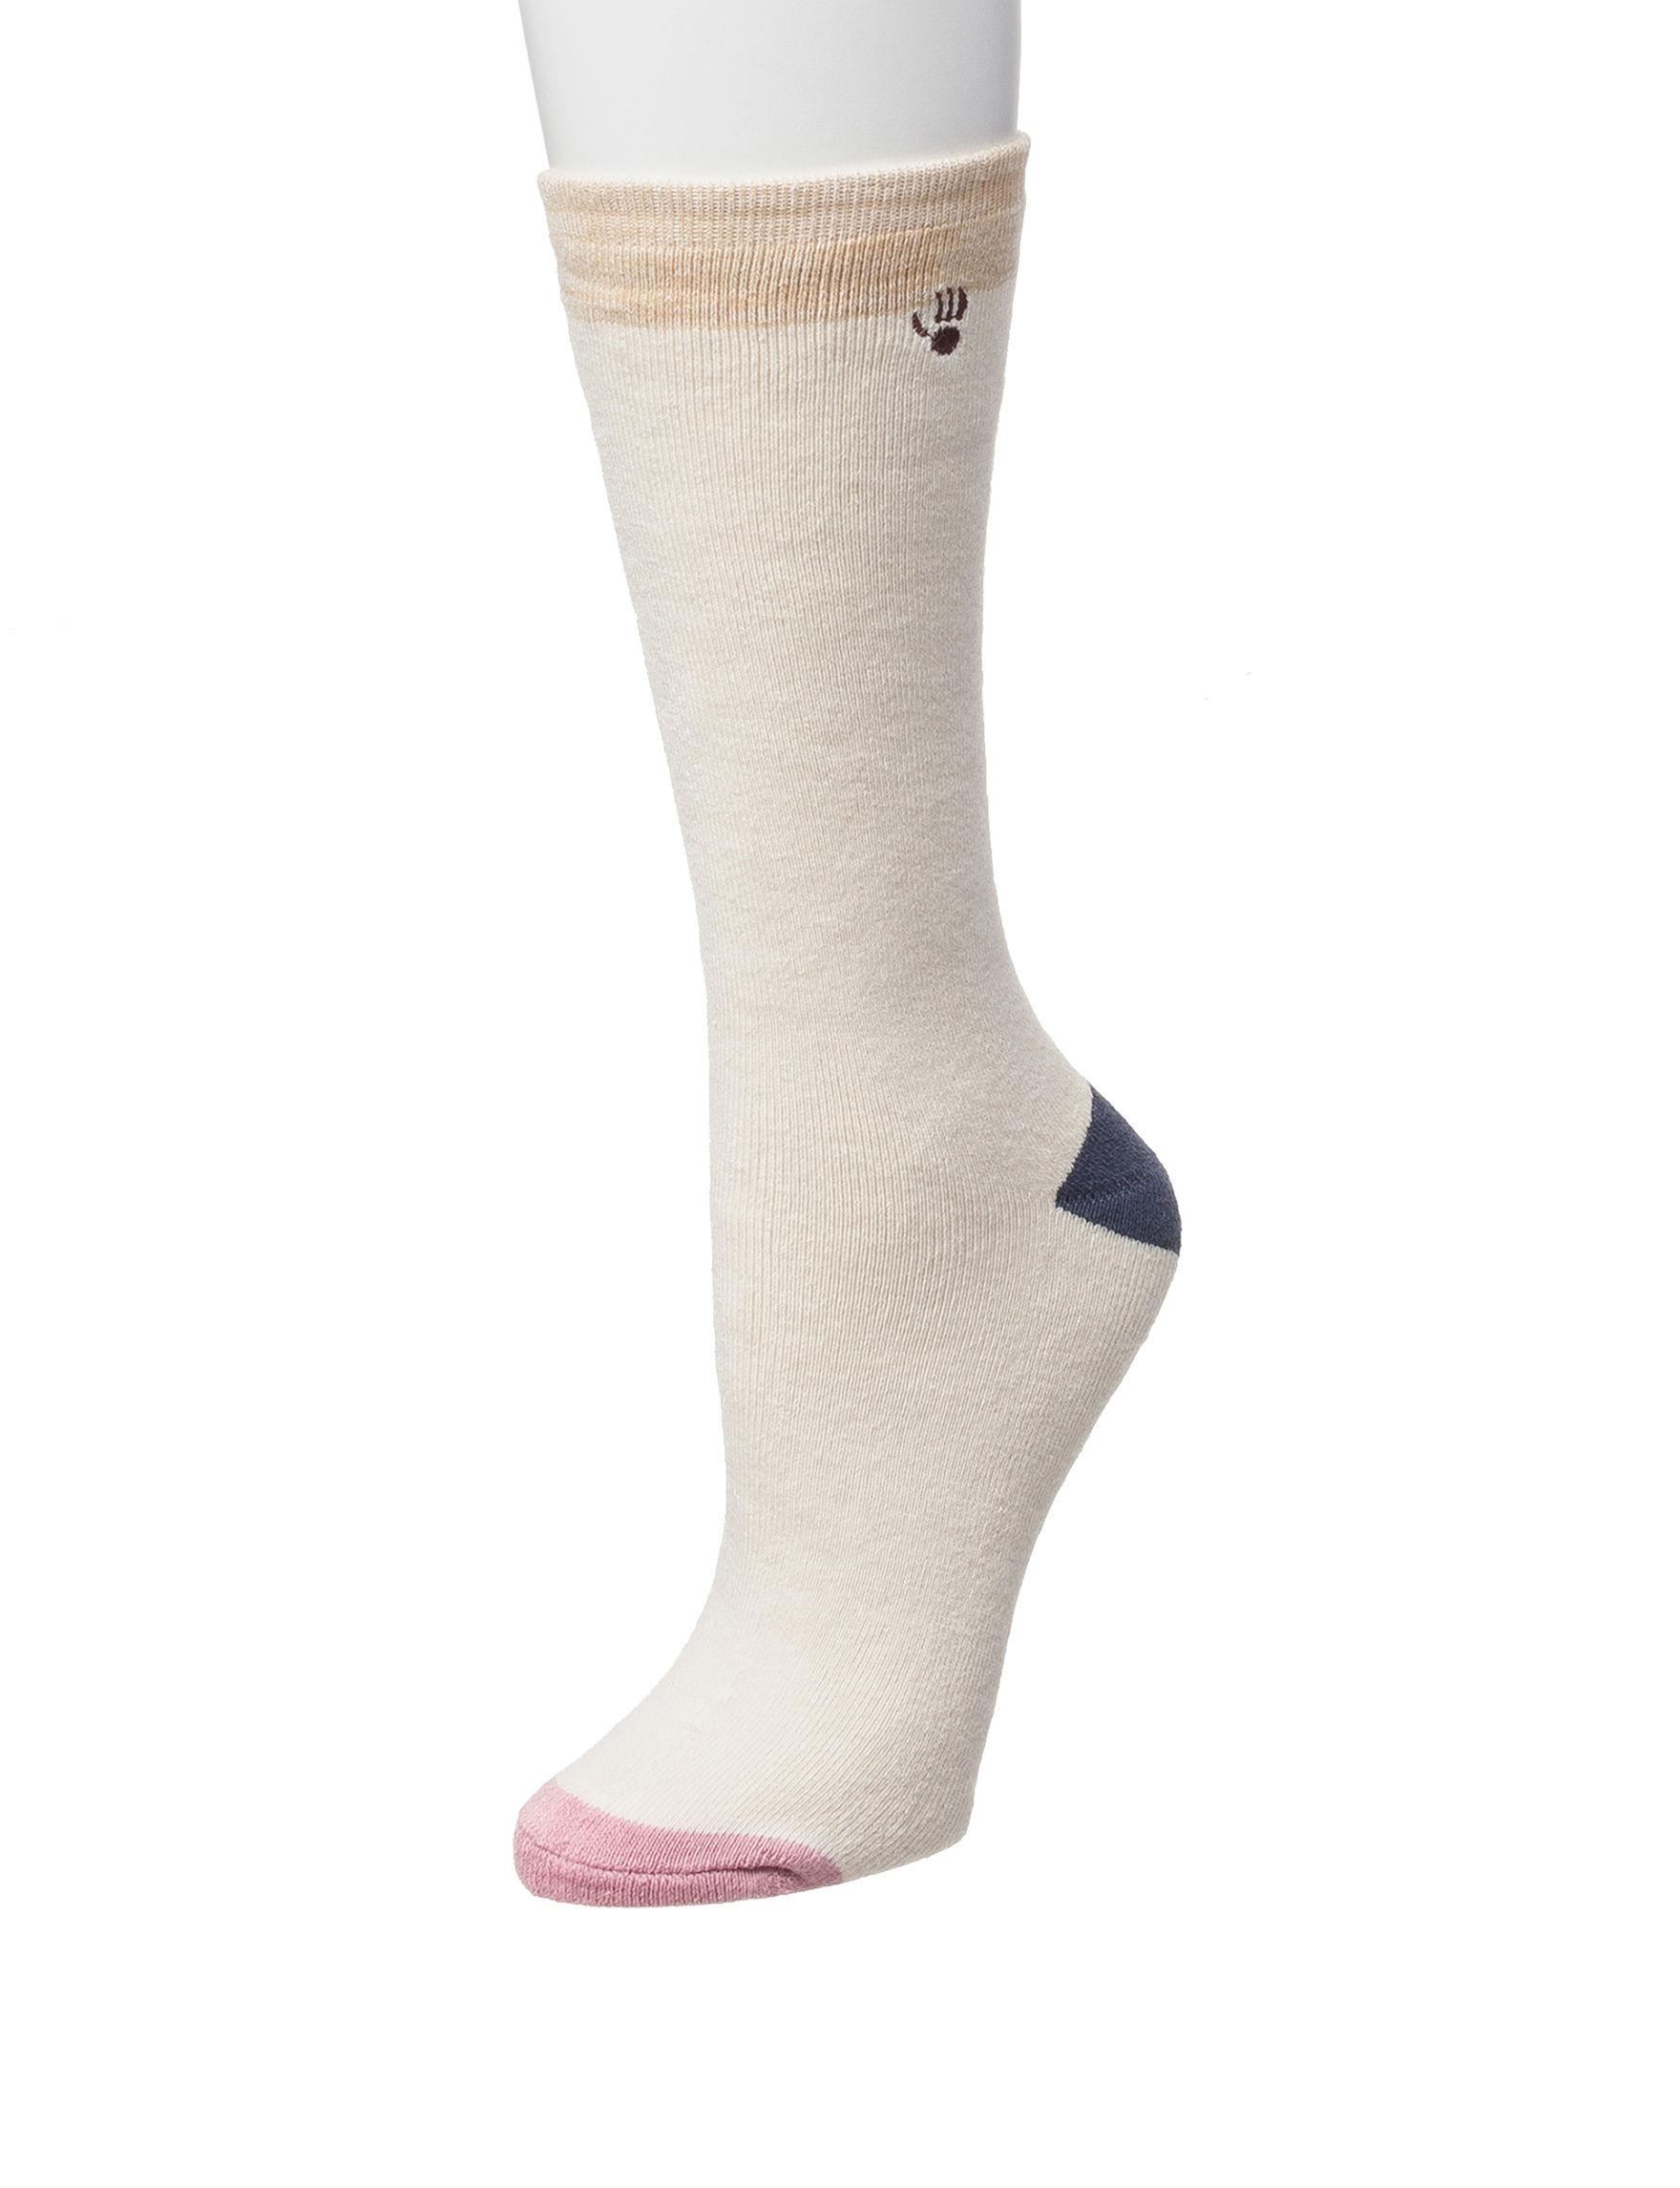 Bearpaw Pink Socks